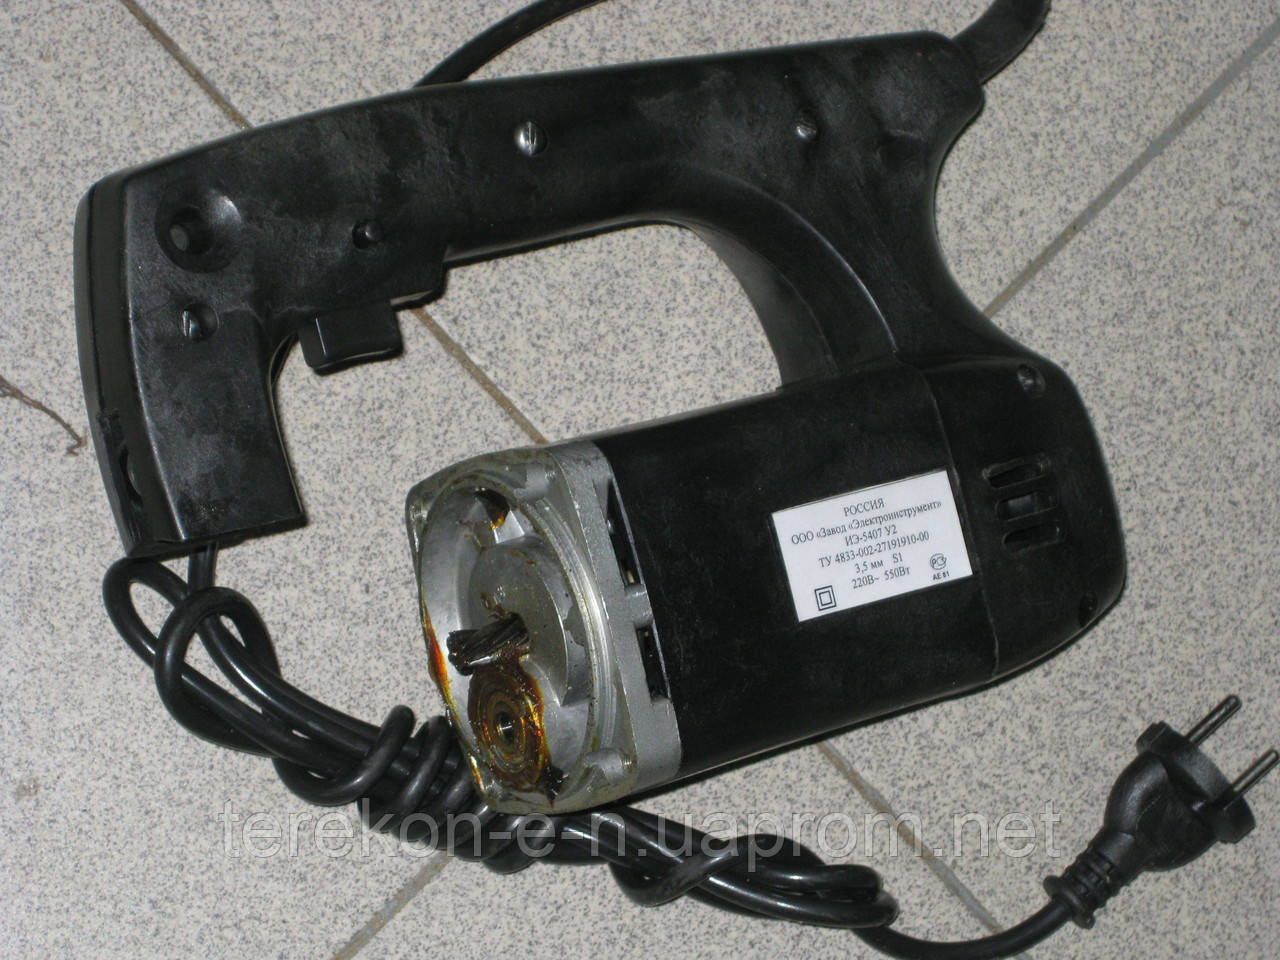 Якір, статор, ручка, кнопка на електроножиці иэ5407у2 (иэ5405у2)